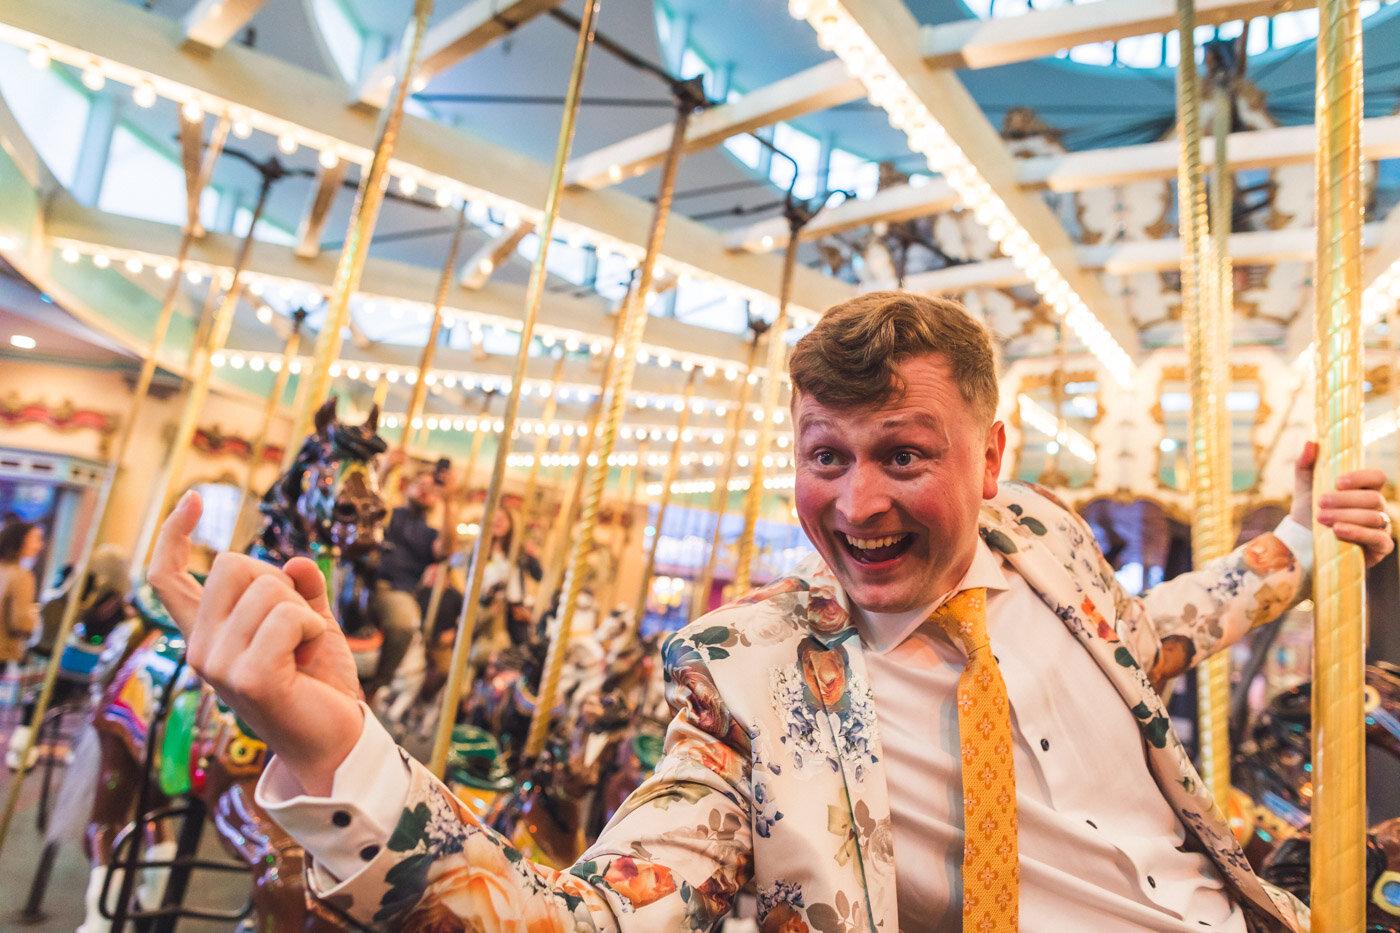 groom-on-carousel